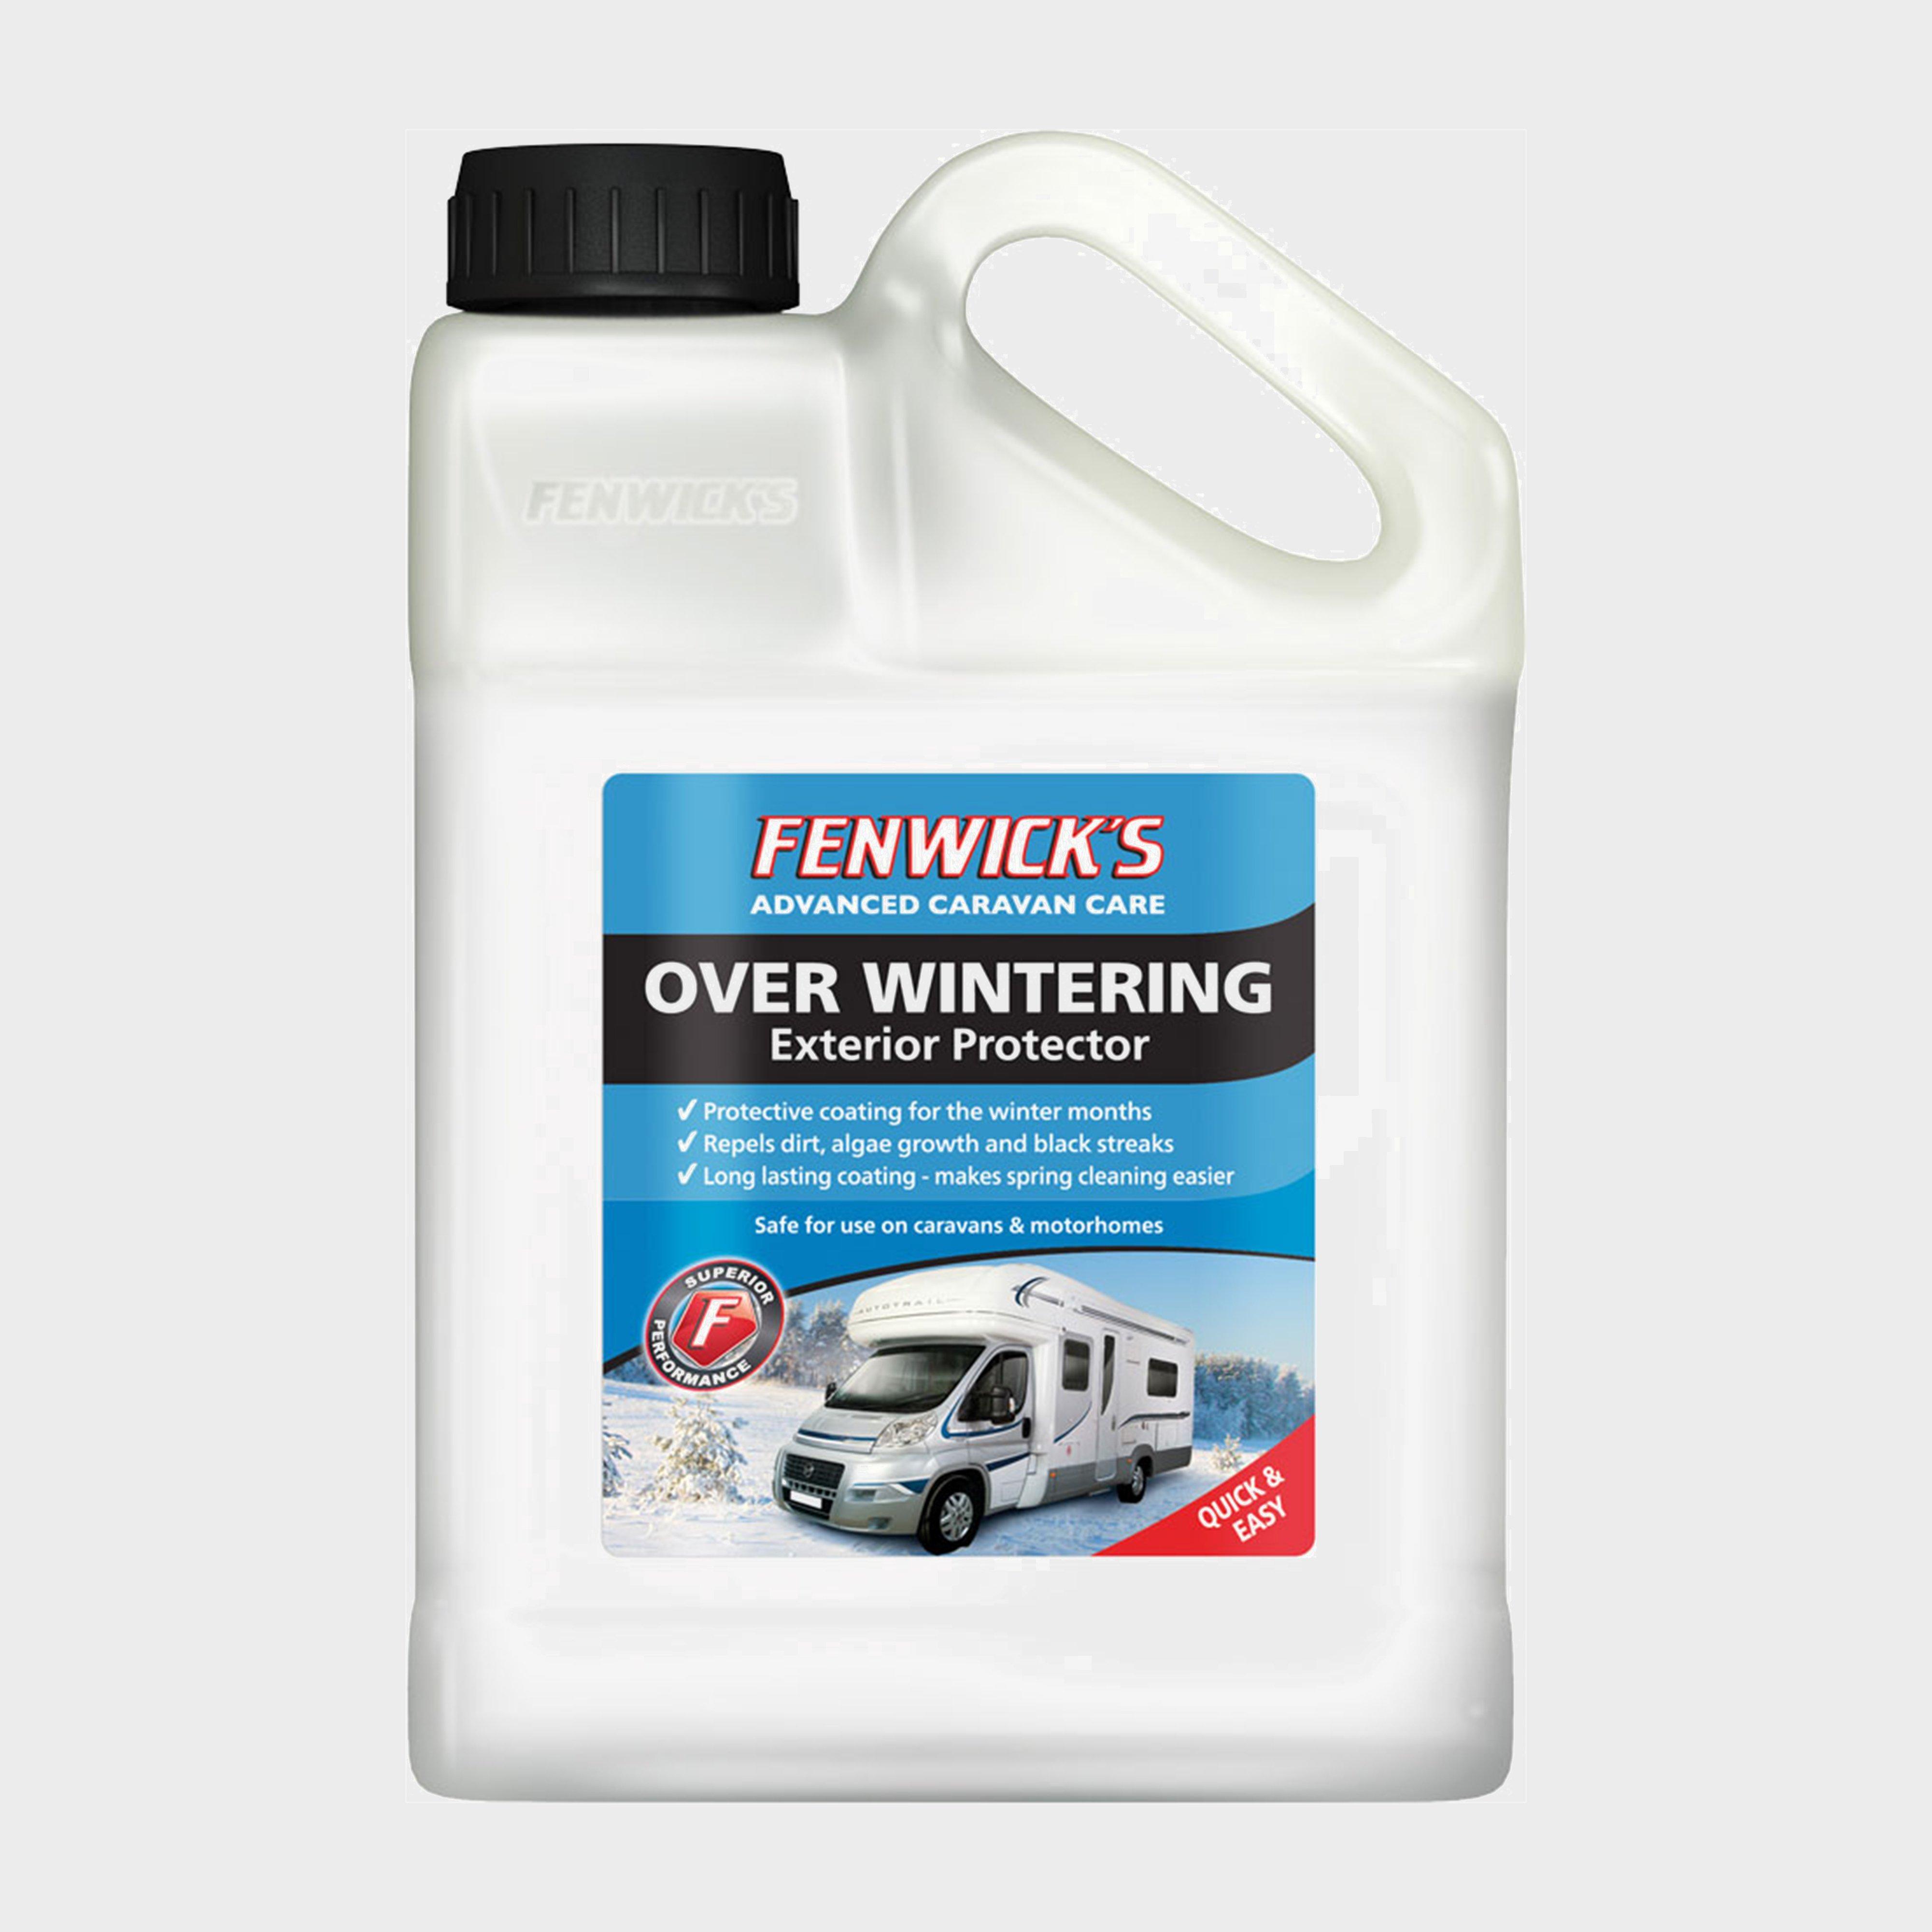 Fenwicks Fenwicks Over Wintering Exterior Protector (1 Litre)